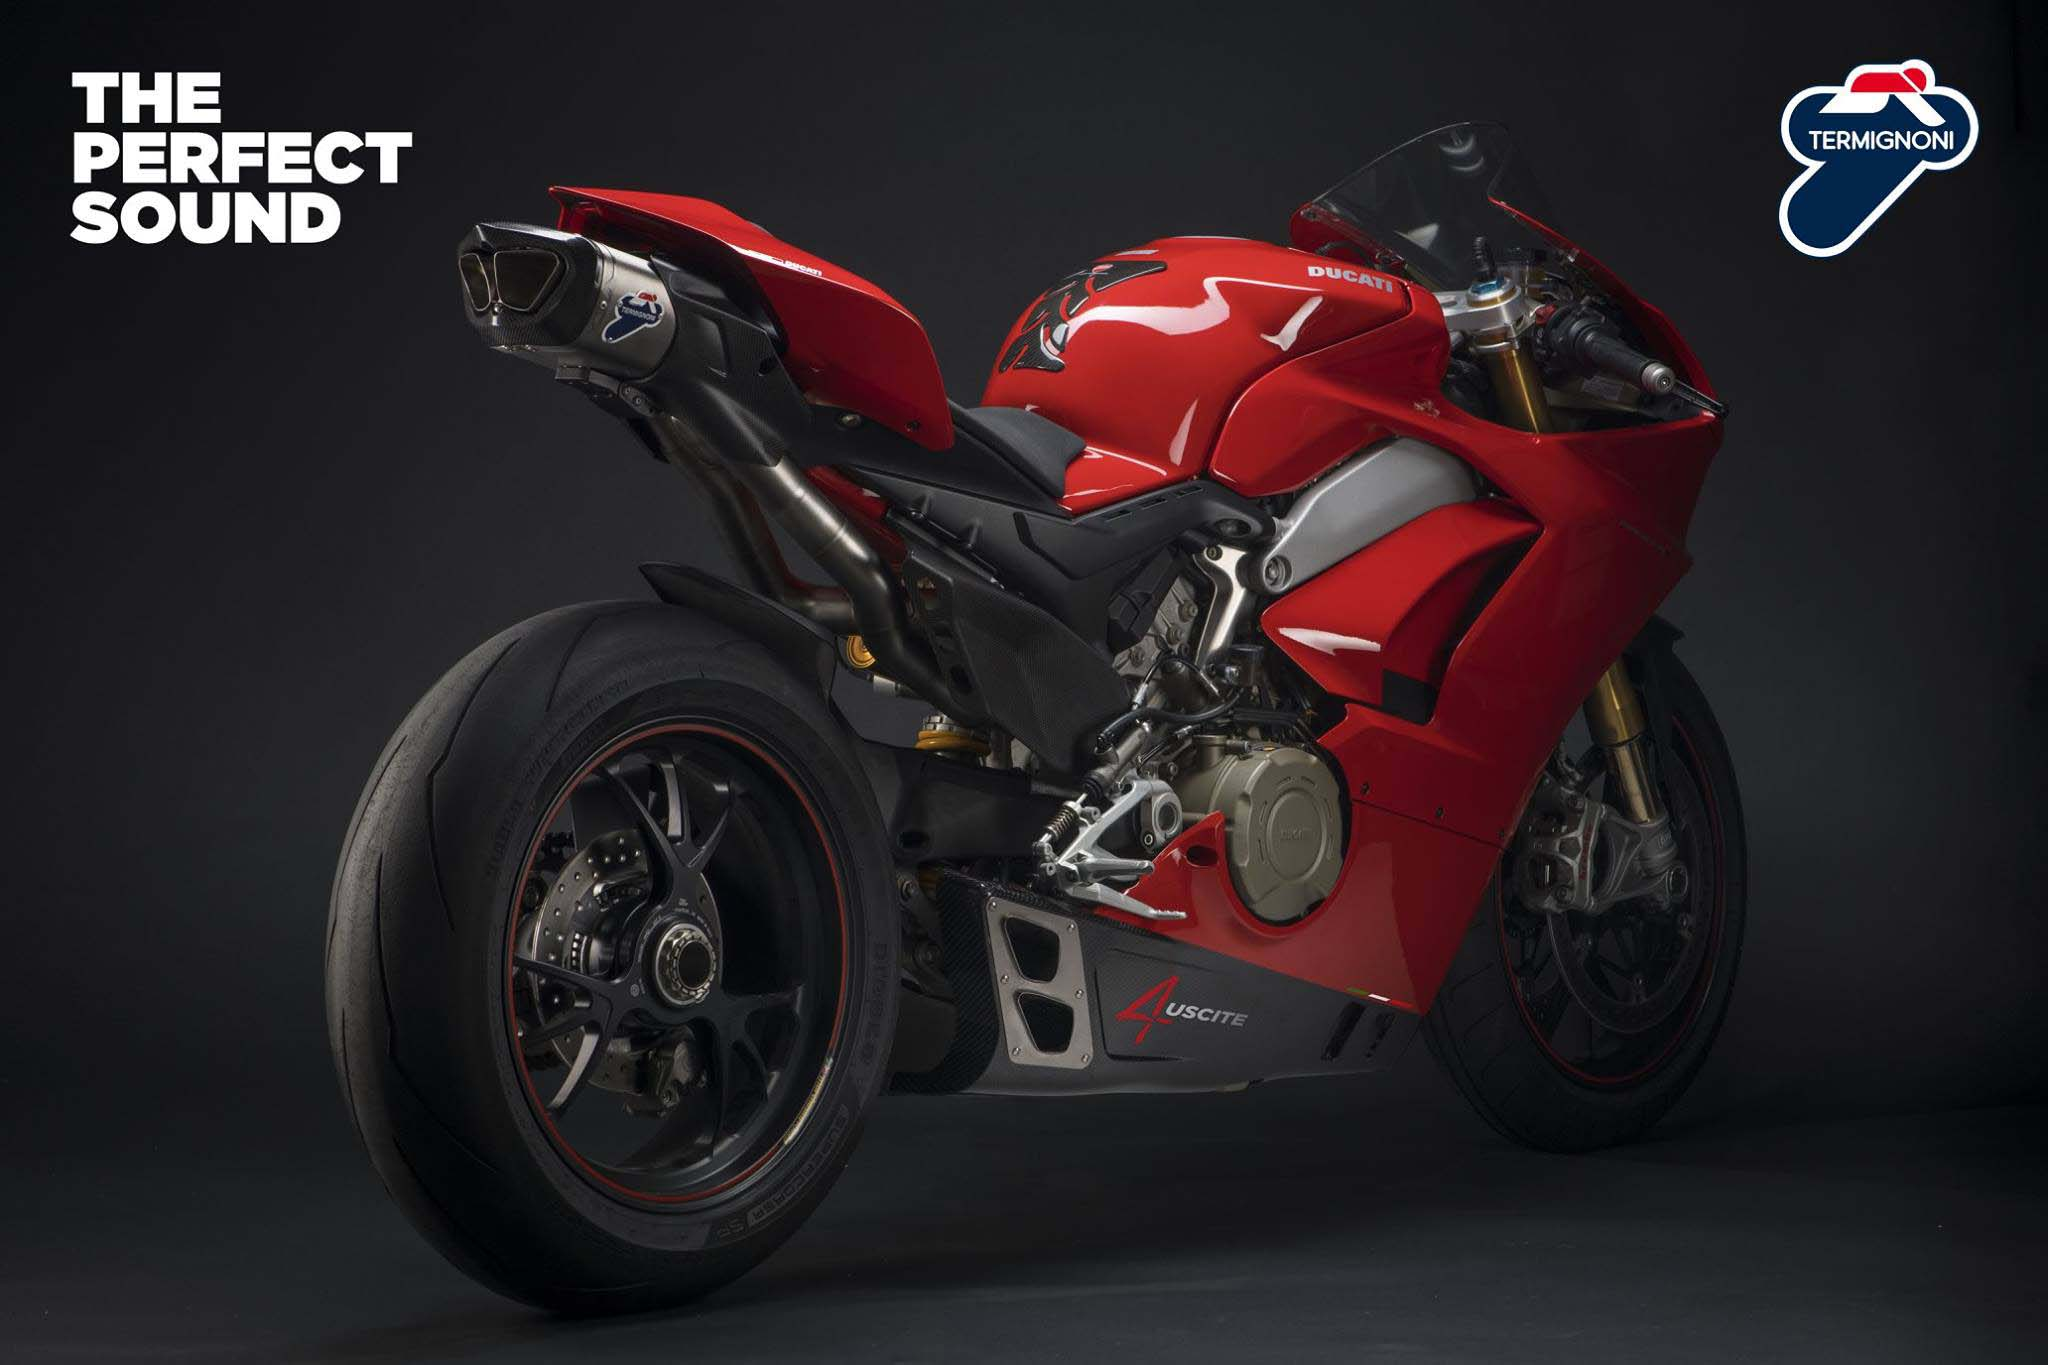 Ducati-Panigale-V4-Termignoni-exhaust-02